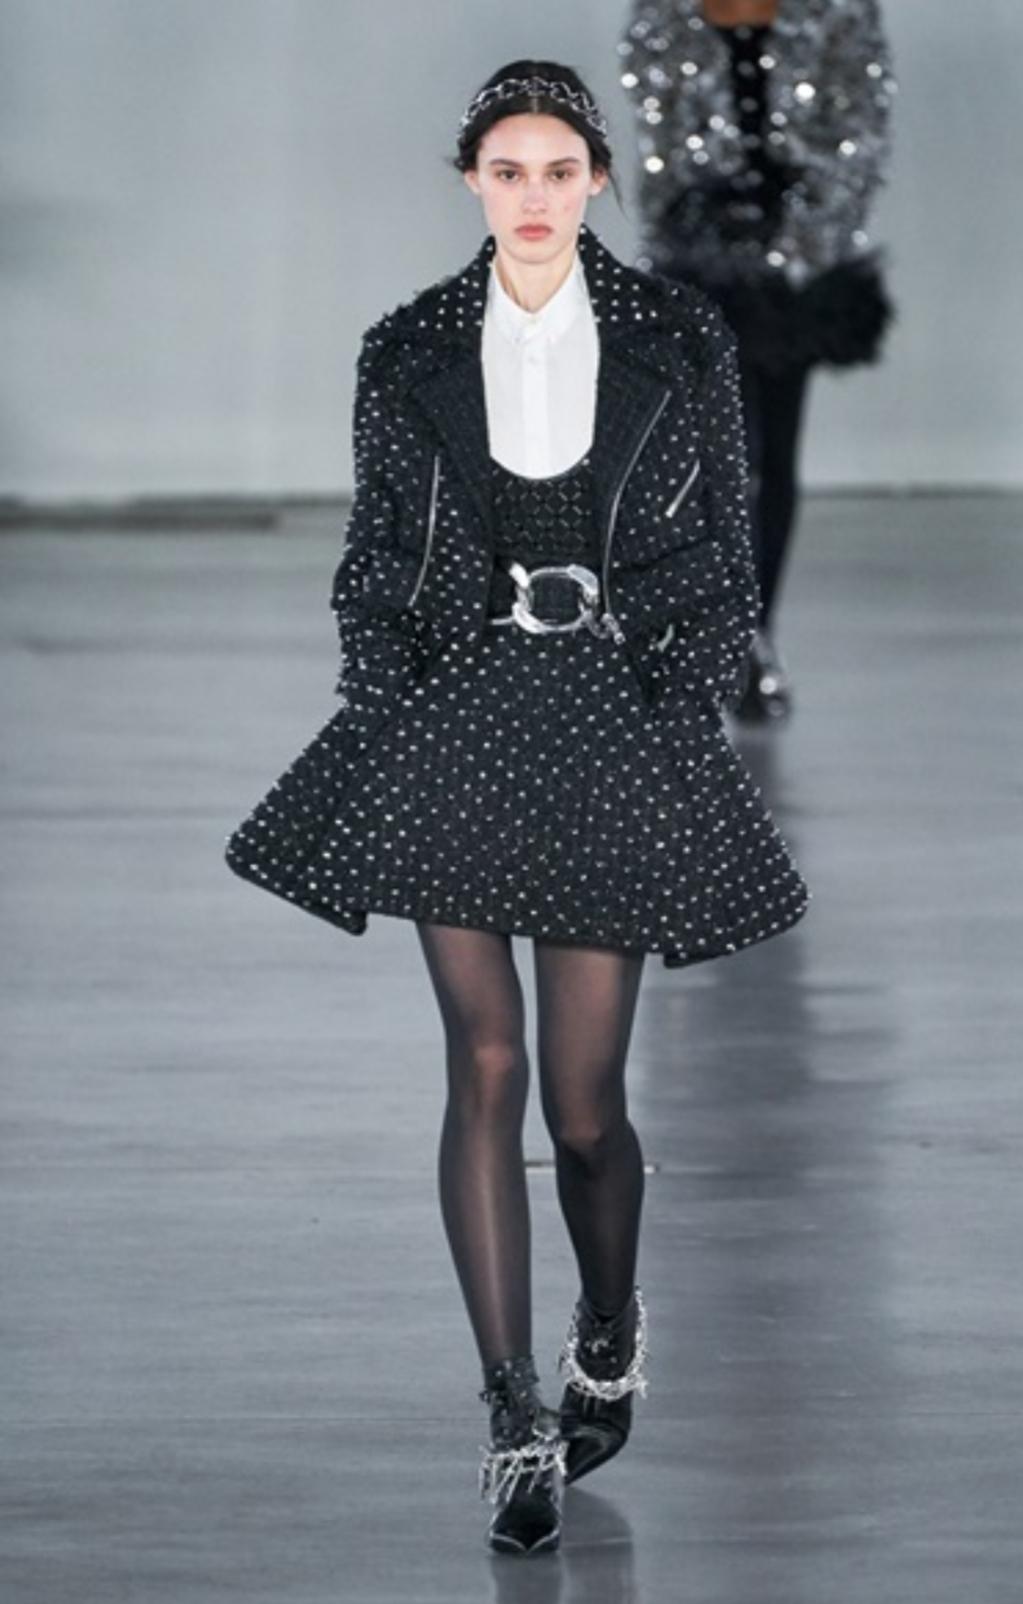 Paris Fashion Week, tra microstampe e trasparenza proseguono le sfilate